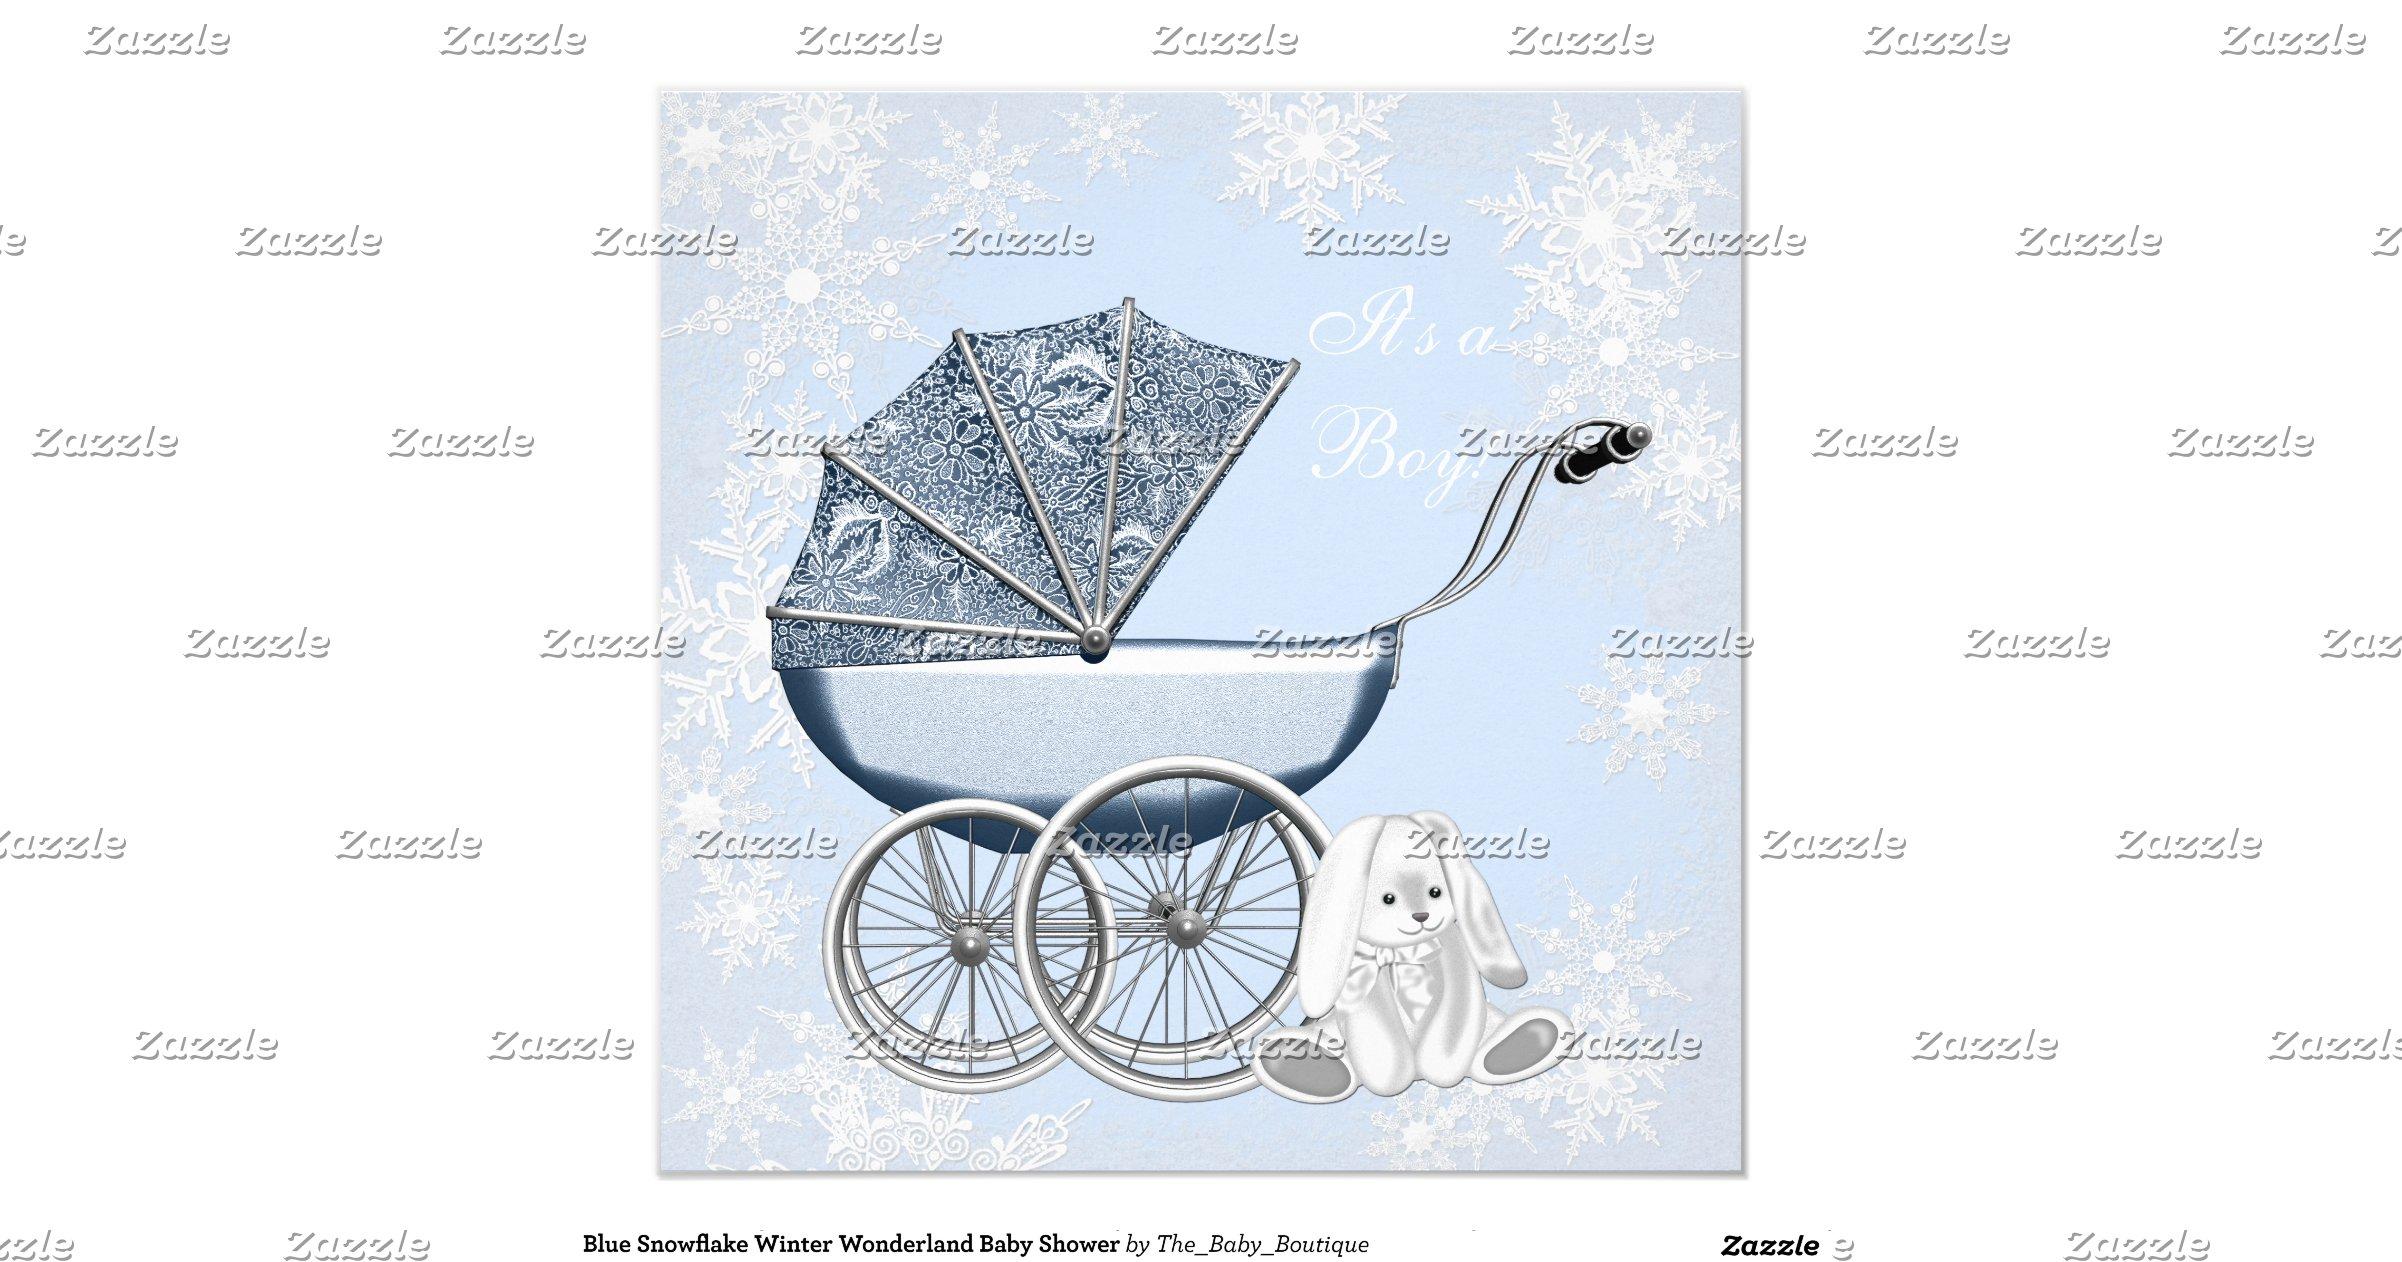 blue snowflake winter wonderland baby shower invitation